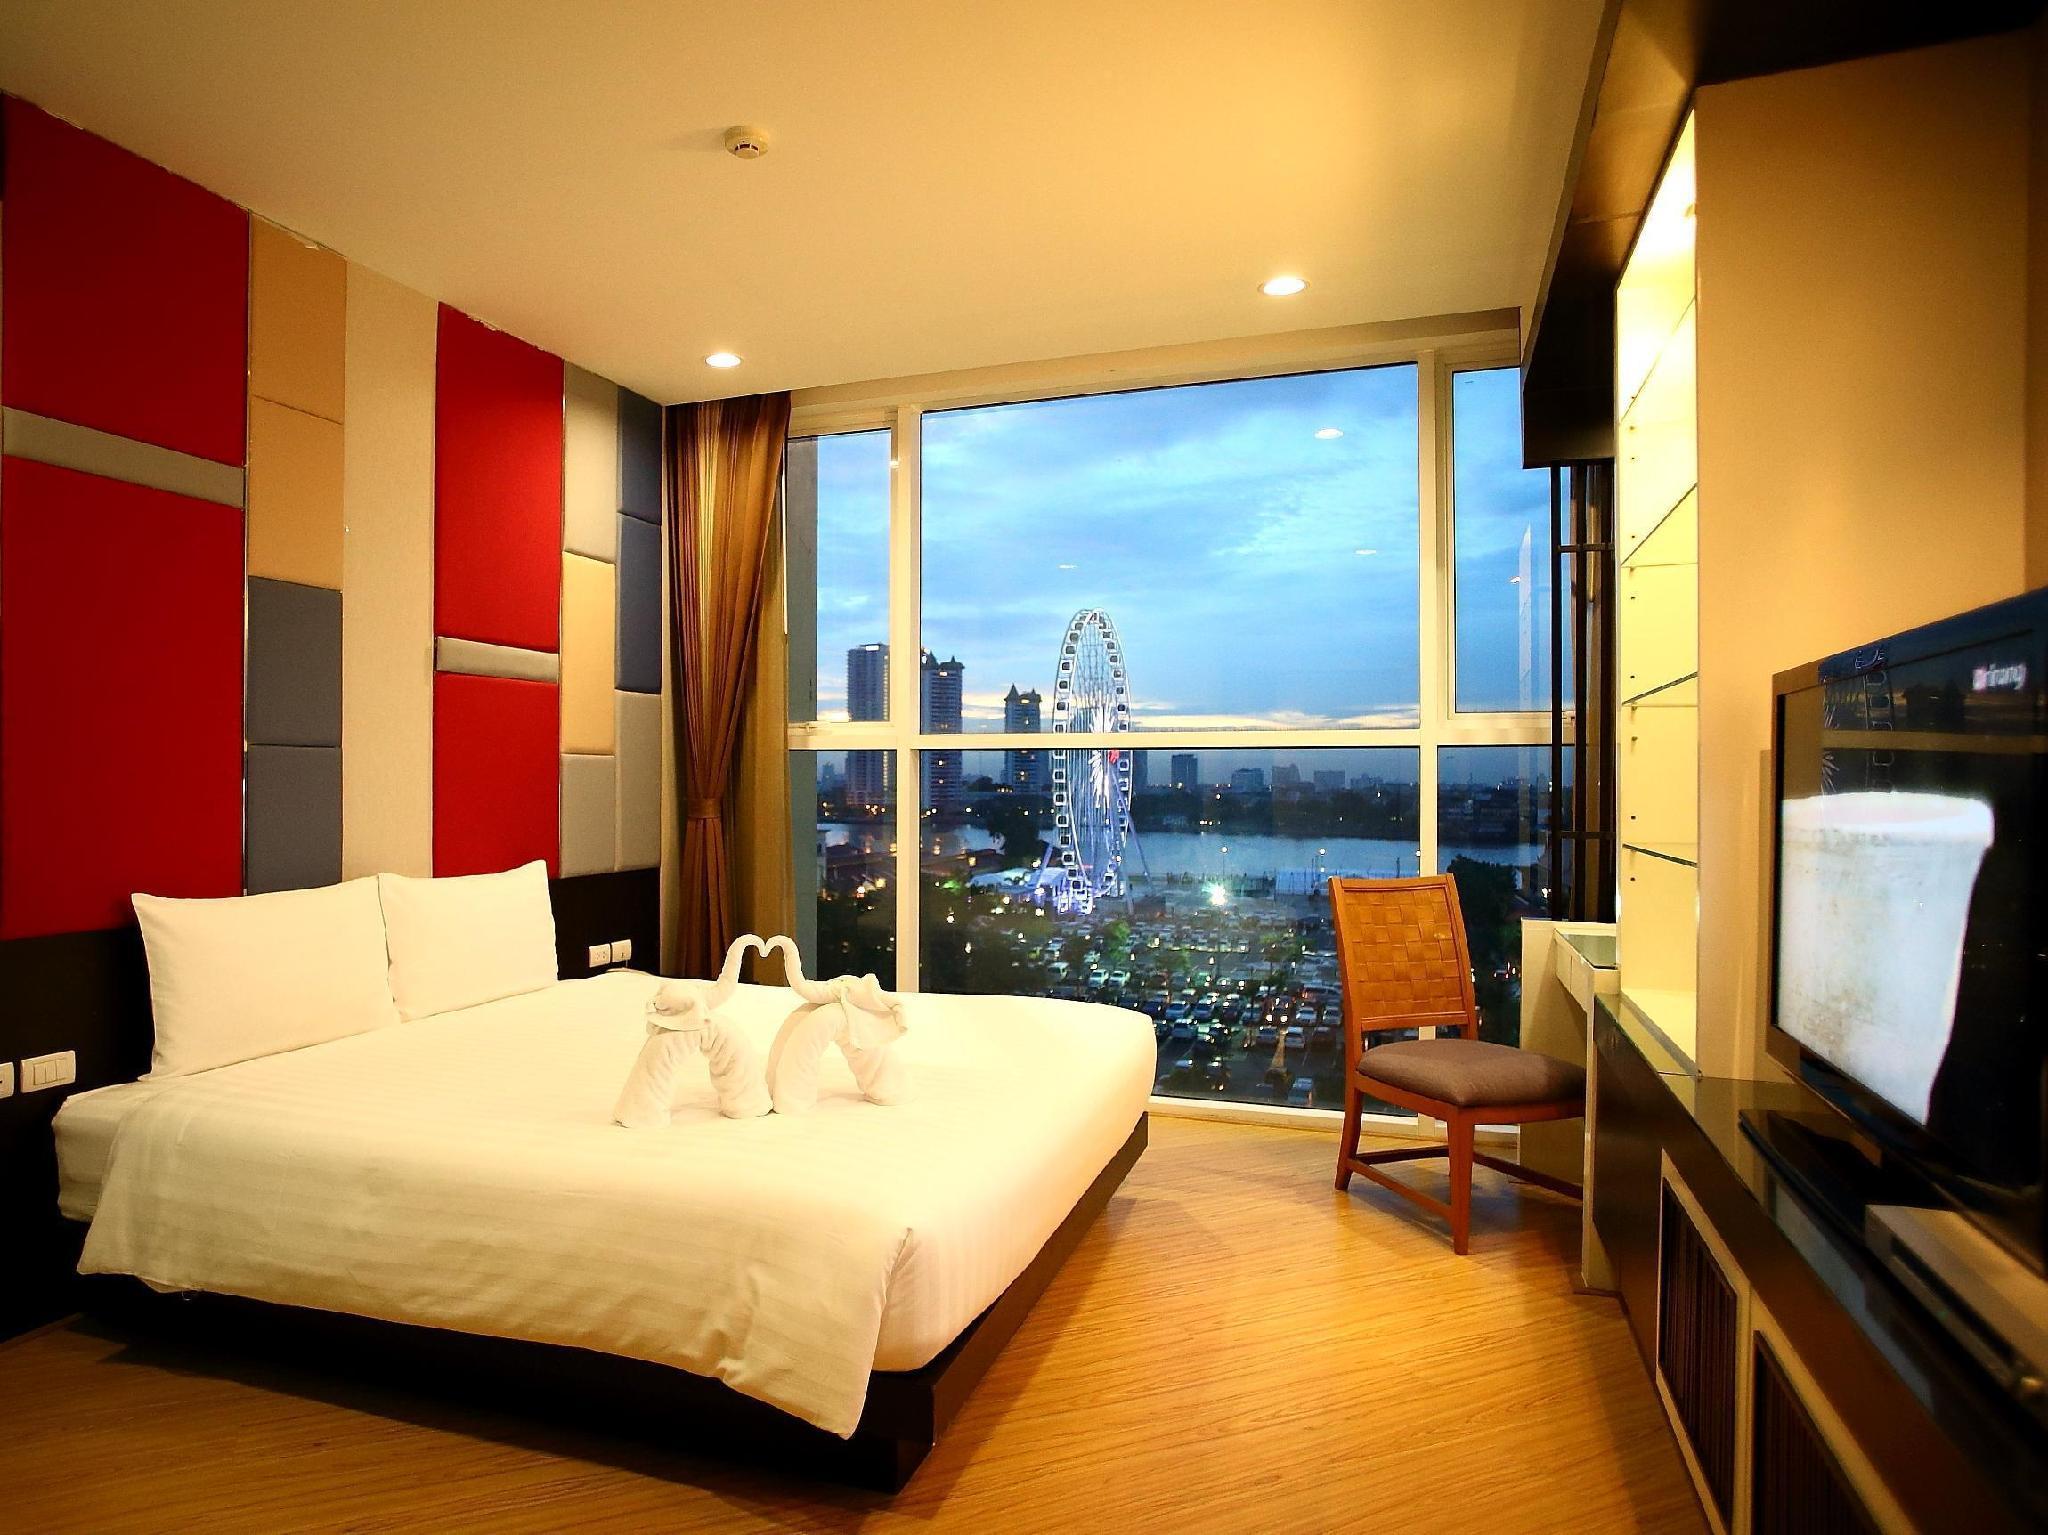 The Sunreno Serviced Apartment Bangkok